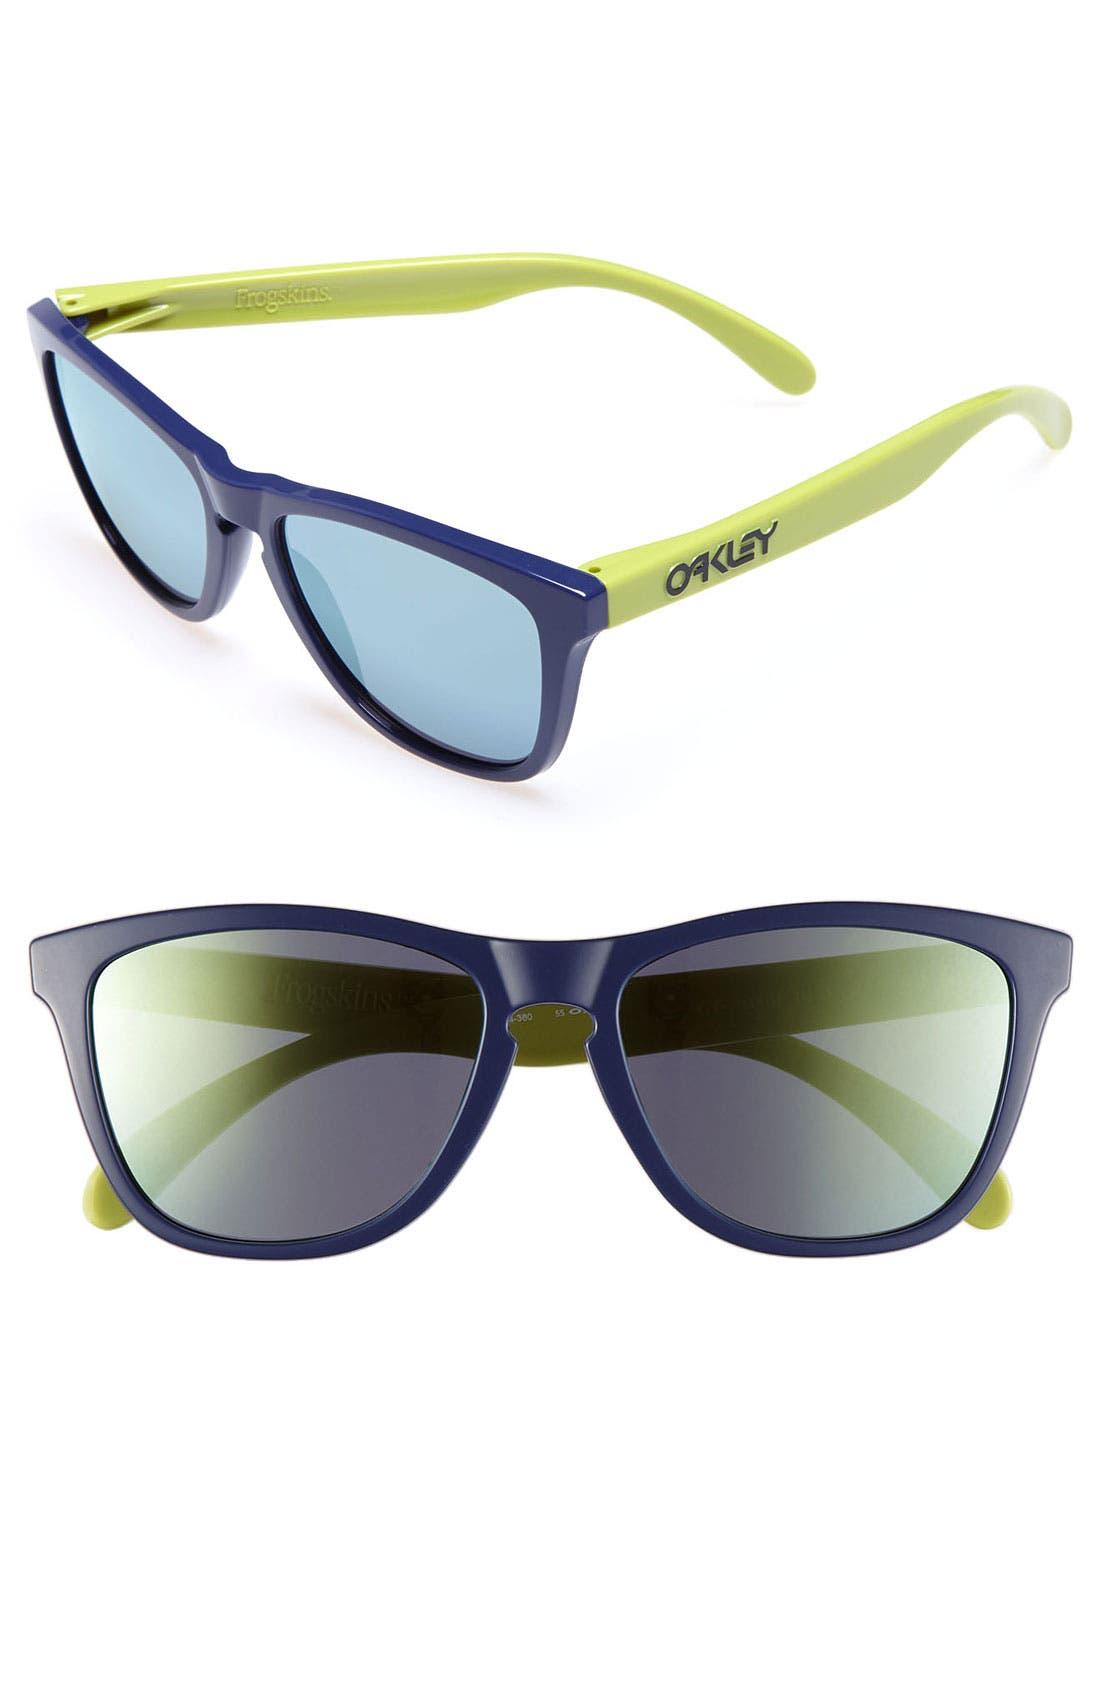 Main Image - Oakley 'RadarLock™' Edge' 155mm Sunglasses